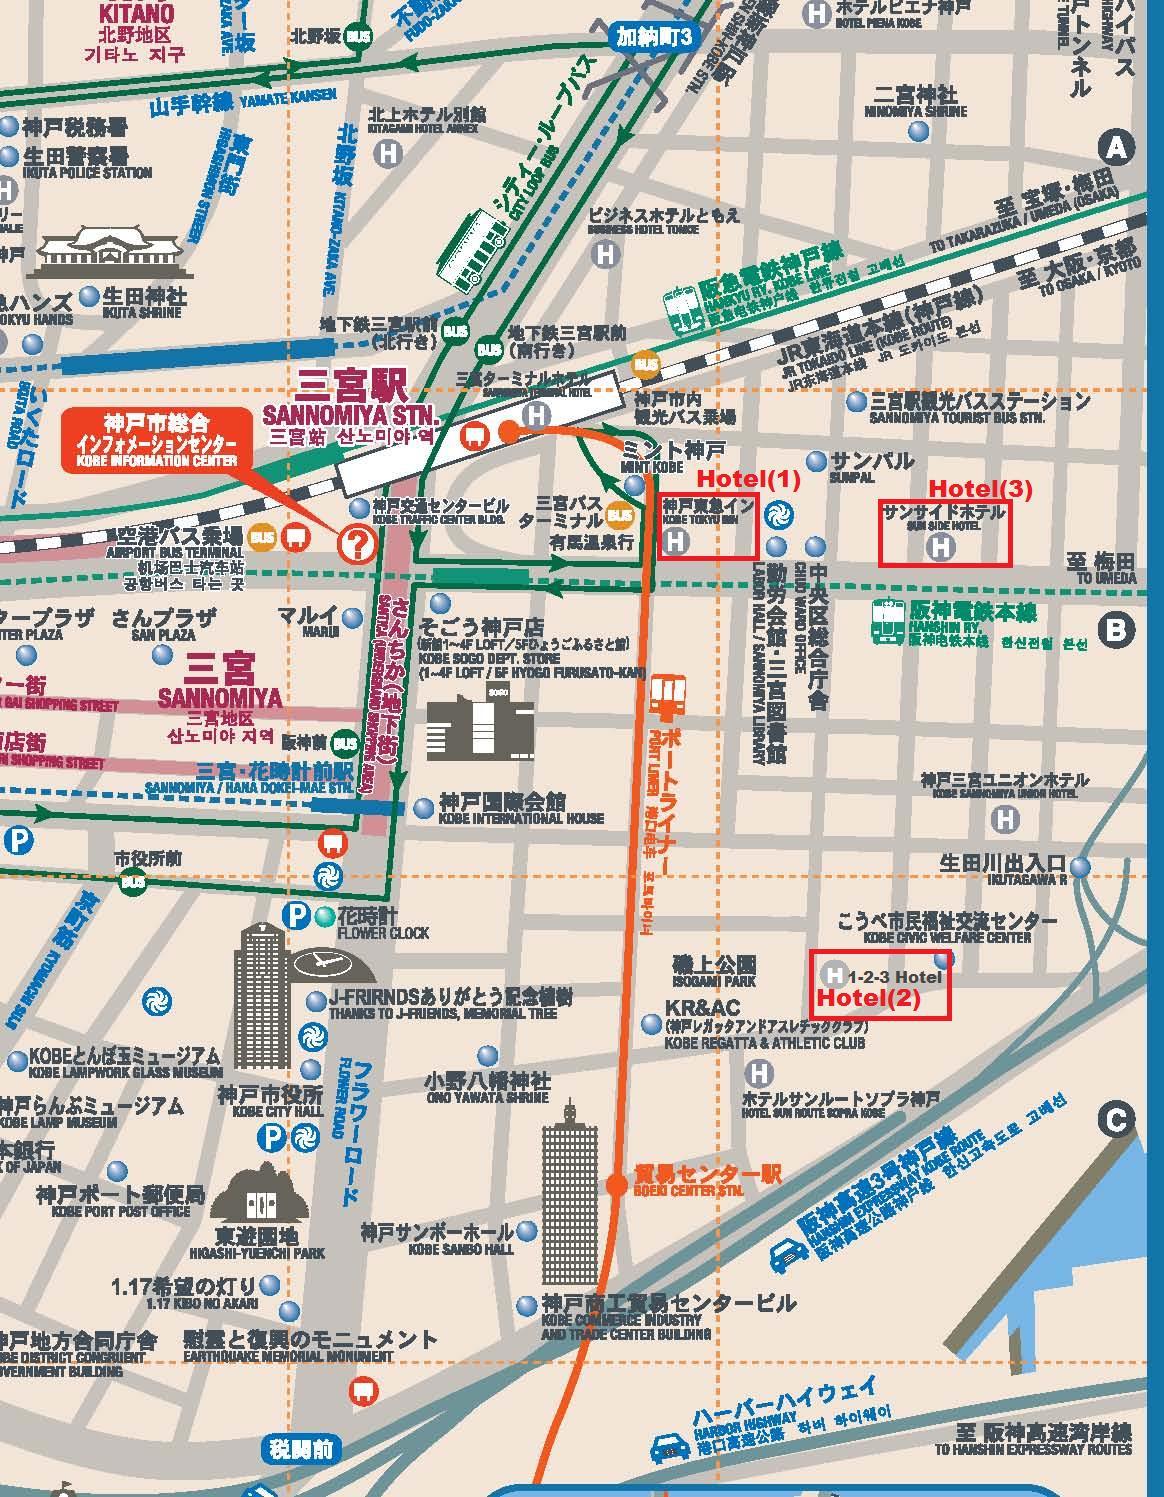 PHYSICS IN COLLISION 2009 - Kobe, Japan, 30 August - 2 September